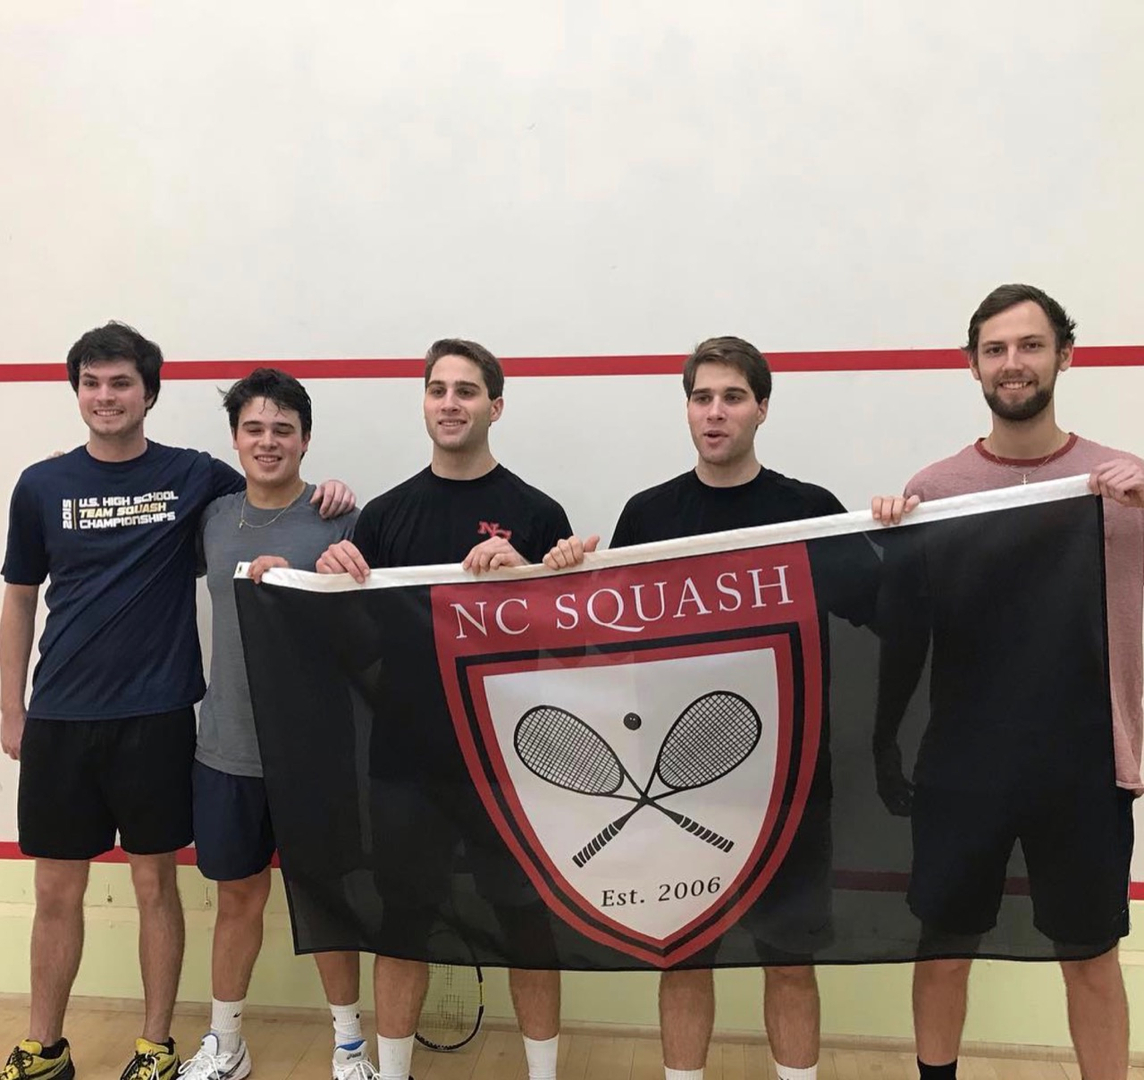 New Cannan alumni  L to R - Kyle Finnican, Christian Megherby, Grayson Bubrosky, Killian Bubrosky, A